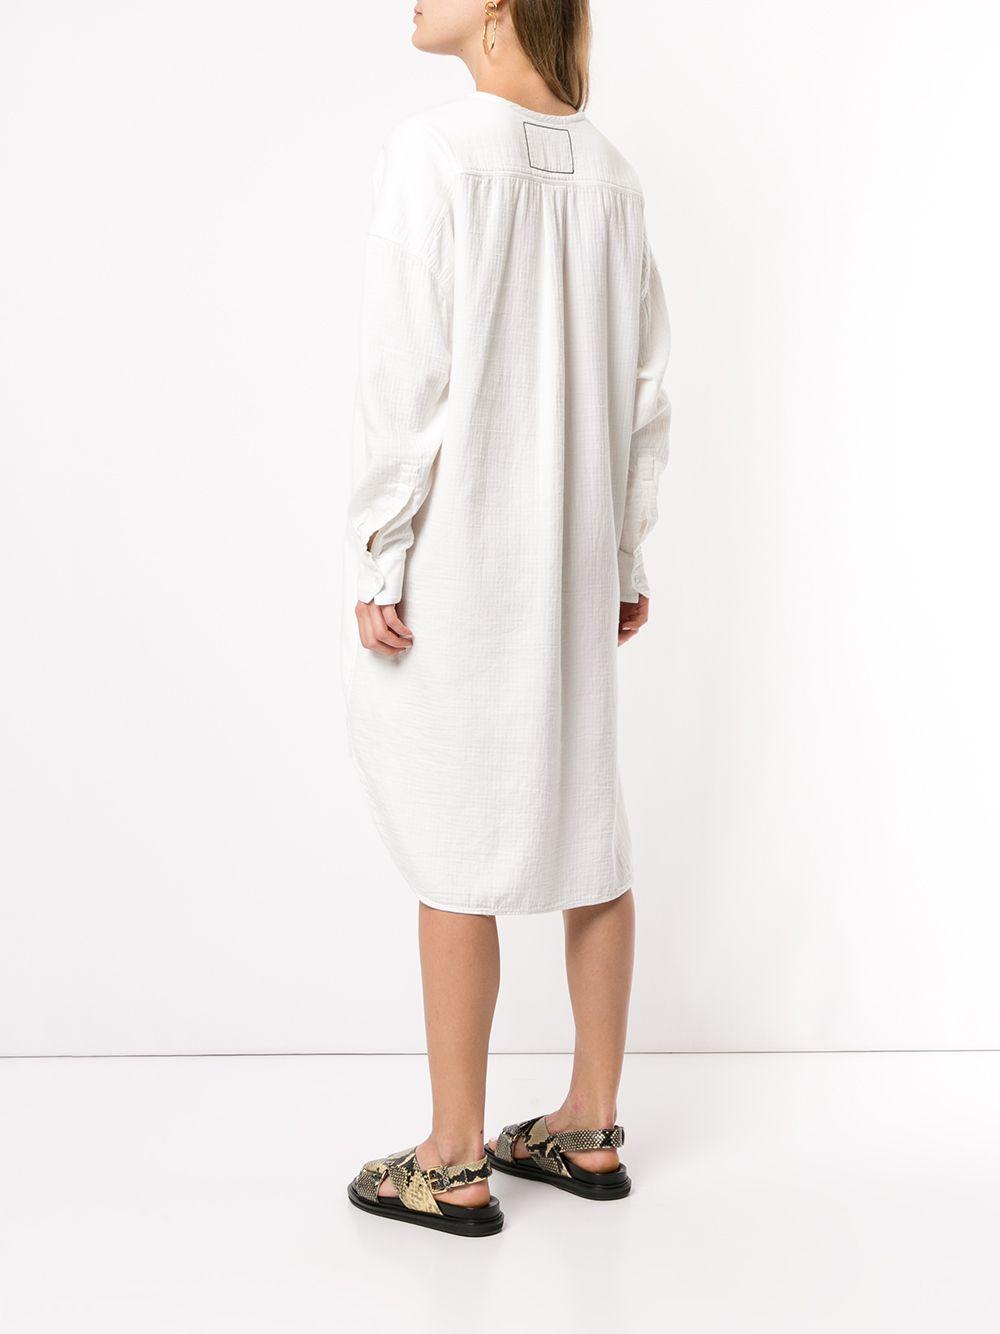 Bassike | платье-рубашка в ломаную клетку | Clouty